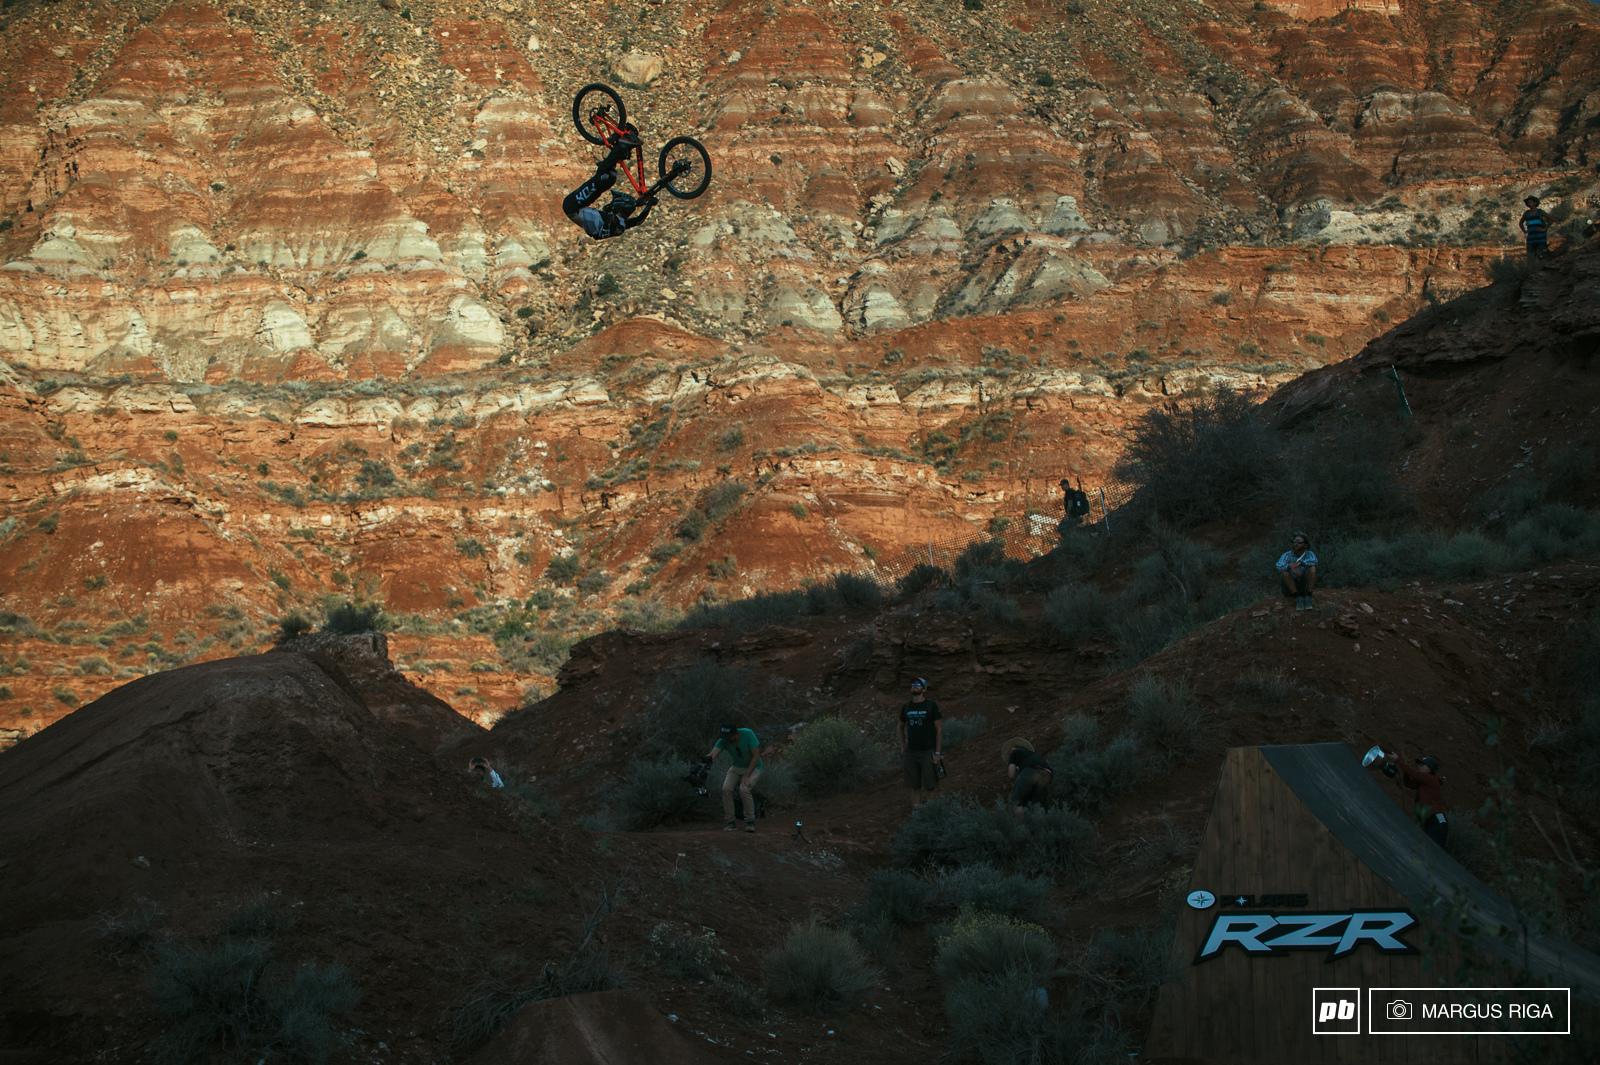 Brett Rheeder no look-back flip. What